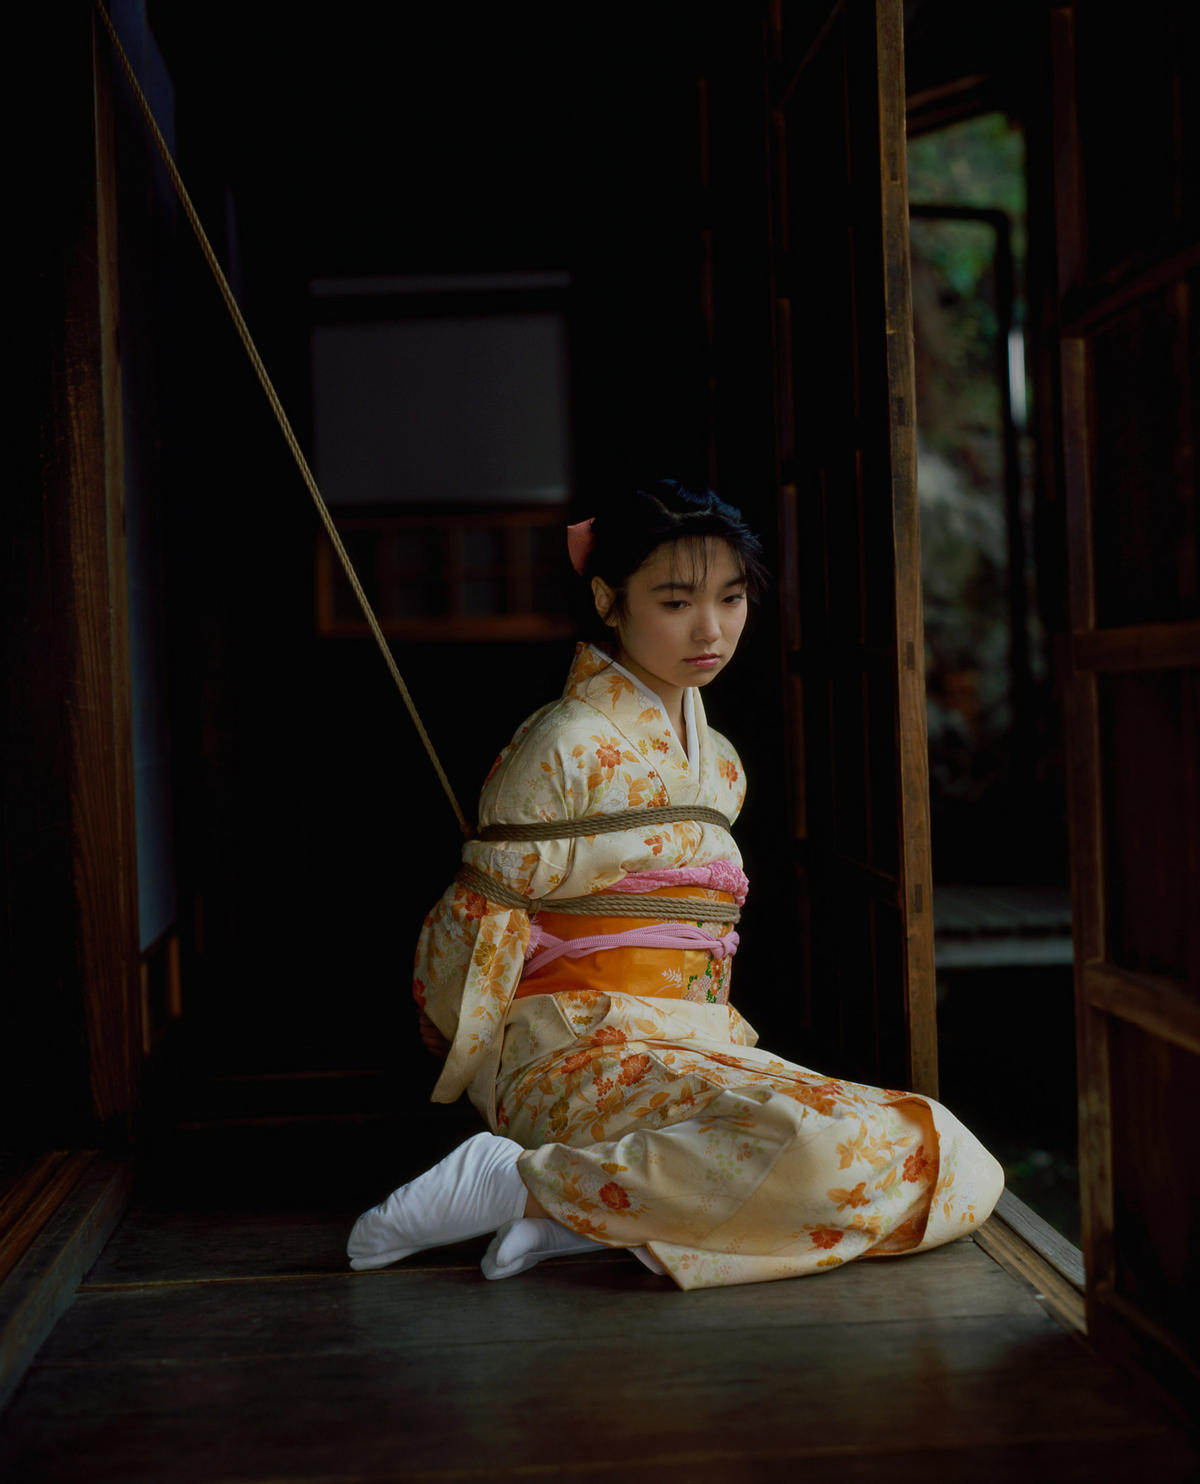 畳 縁側 縛る 日本家屋 情緒 和室 緊縛 エロ画像【24】